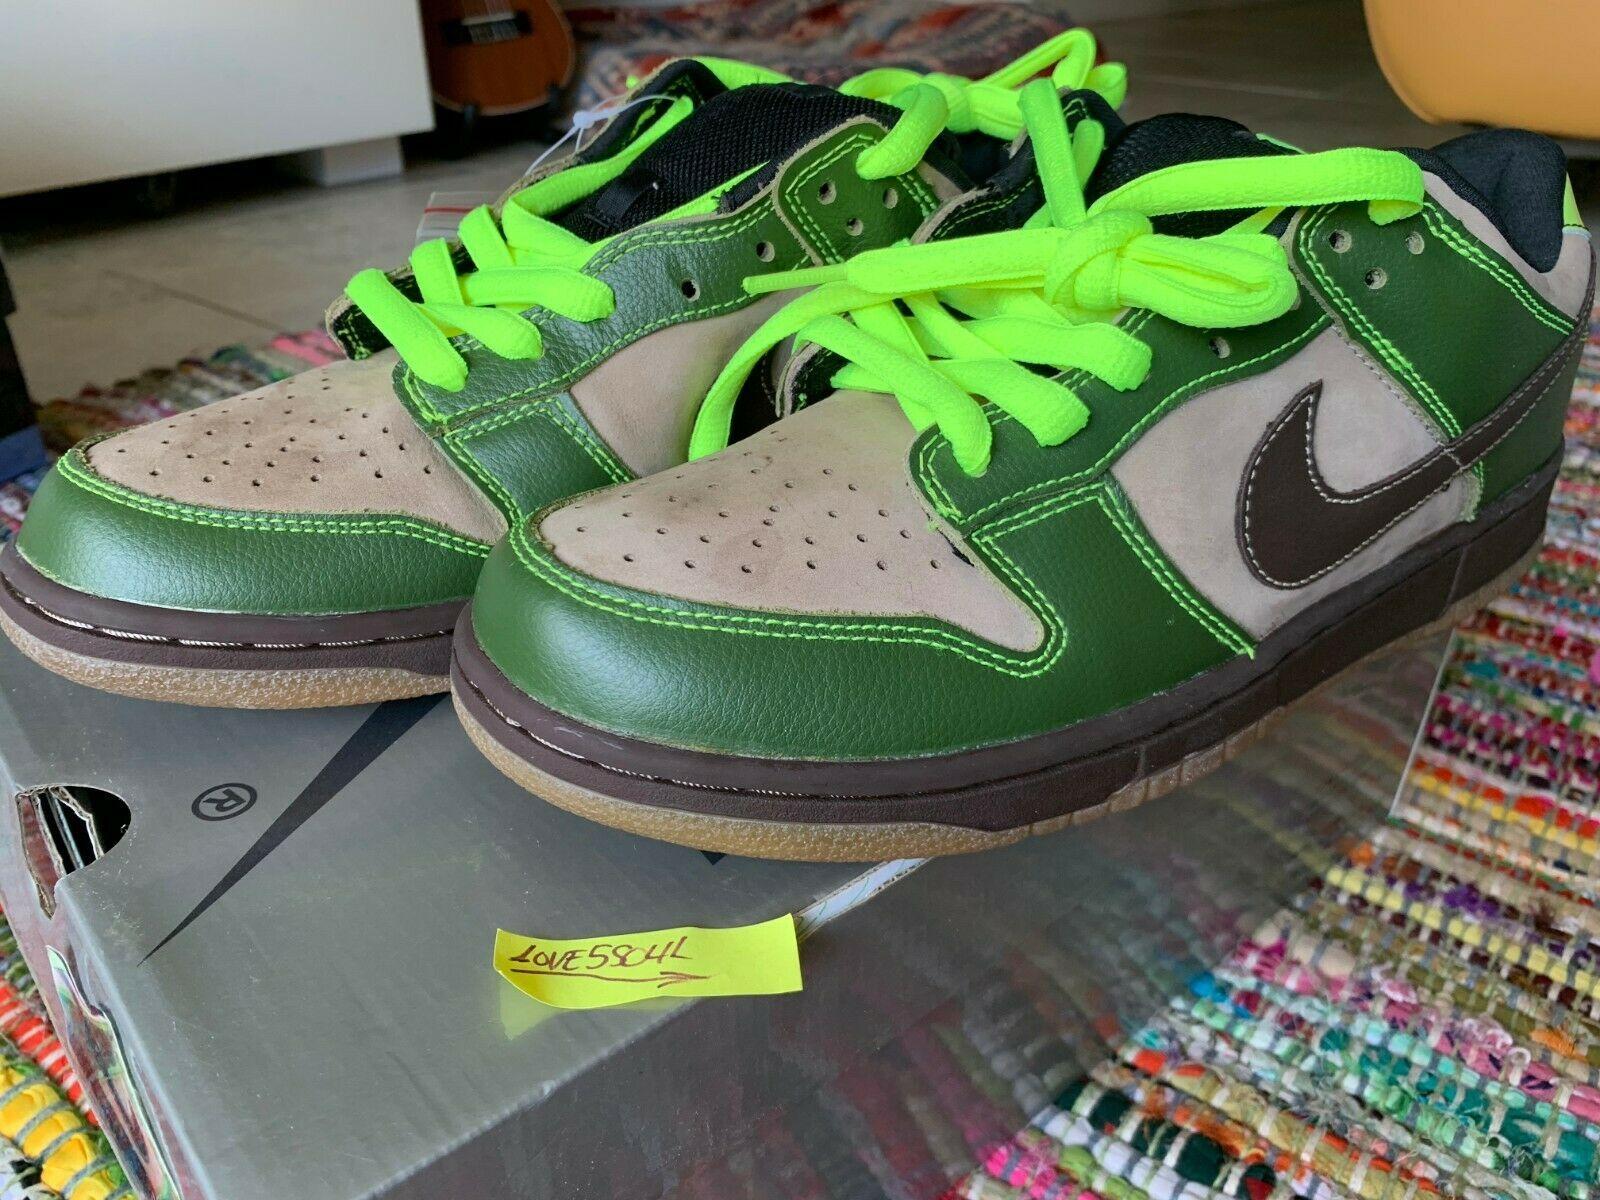 huge discount d81ac 34d67 Nike Dunk Low Pro SB JEDI 11 DS Super SILVER BOX HEAT 1st Series 100%